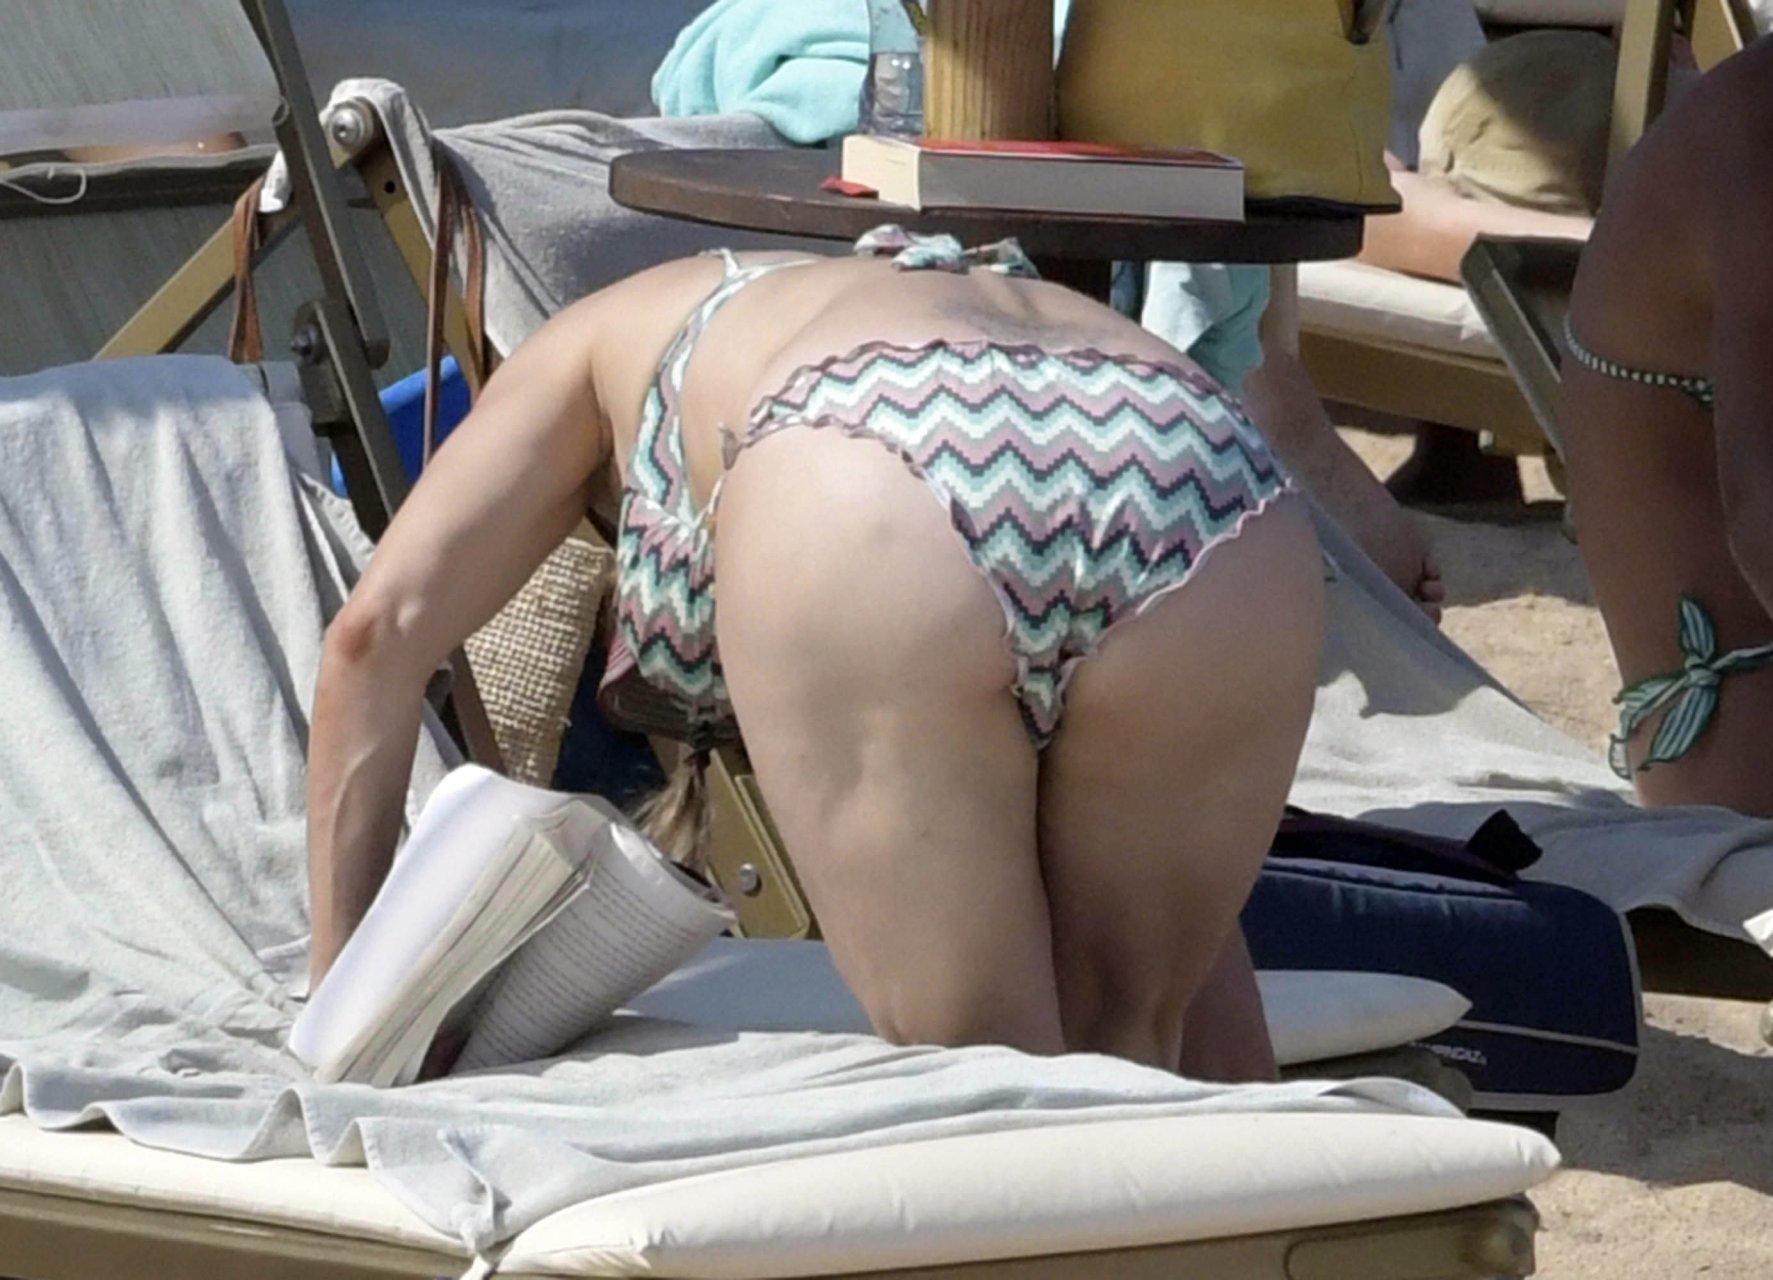 Taylor-Dayne-Sexy-TheFappeningBlog.com-4.jpg